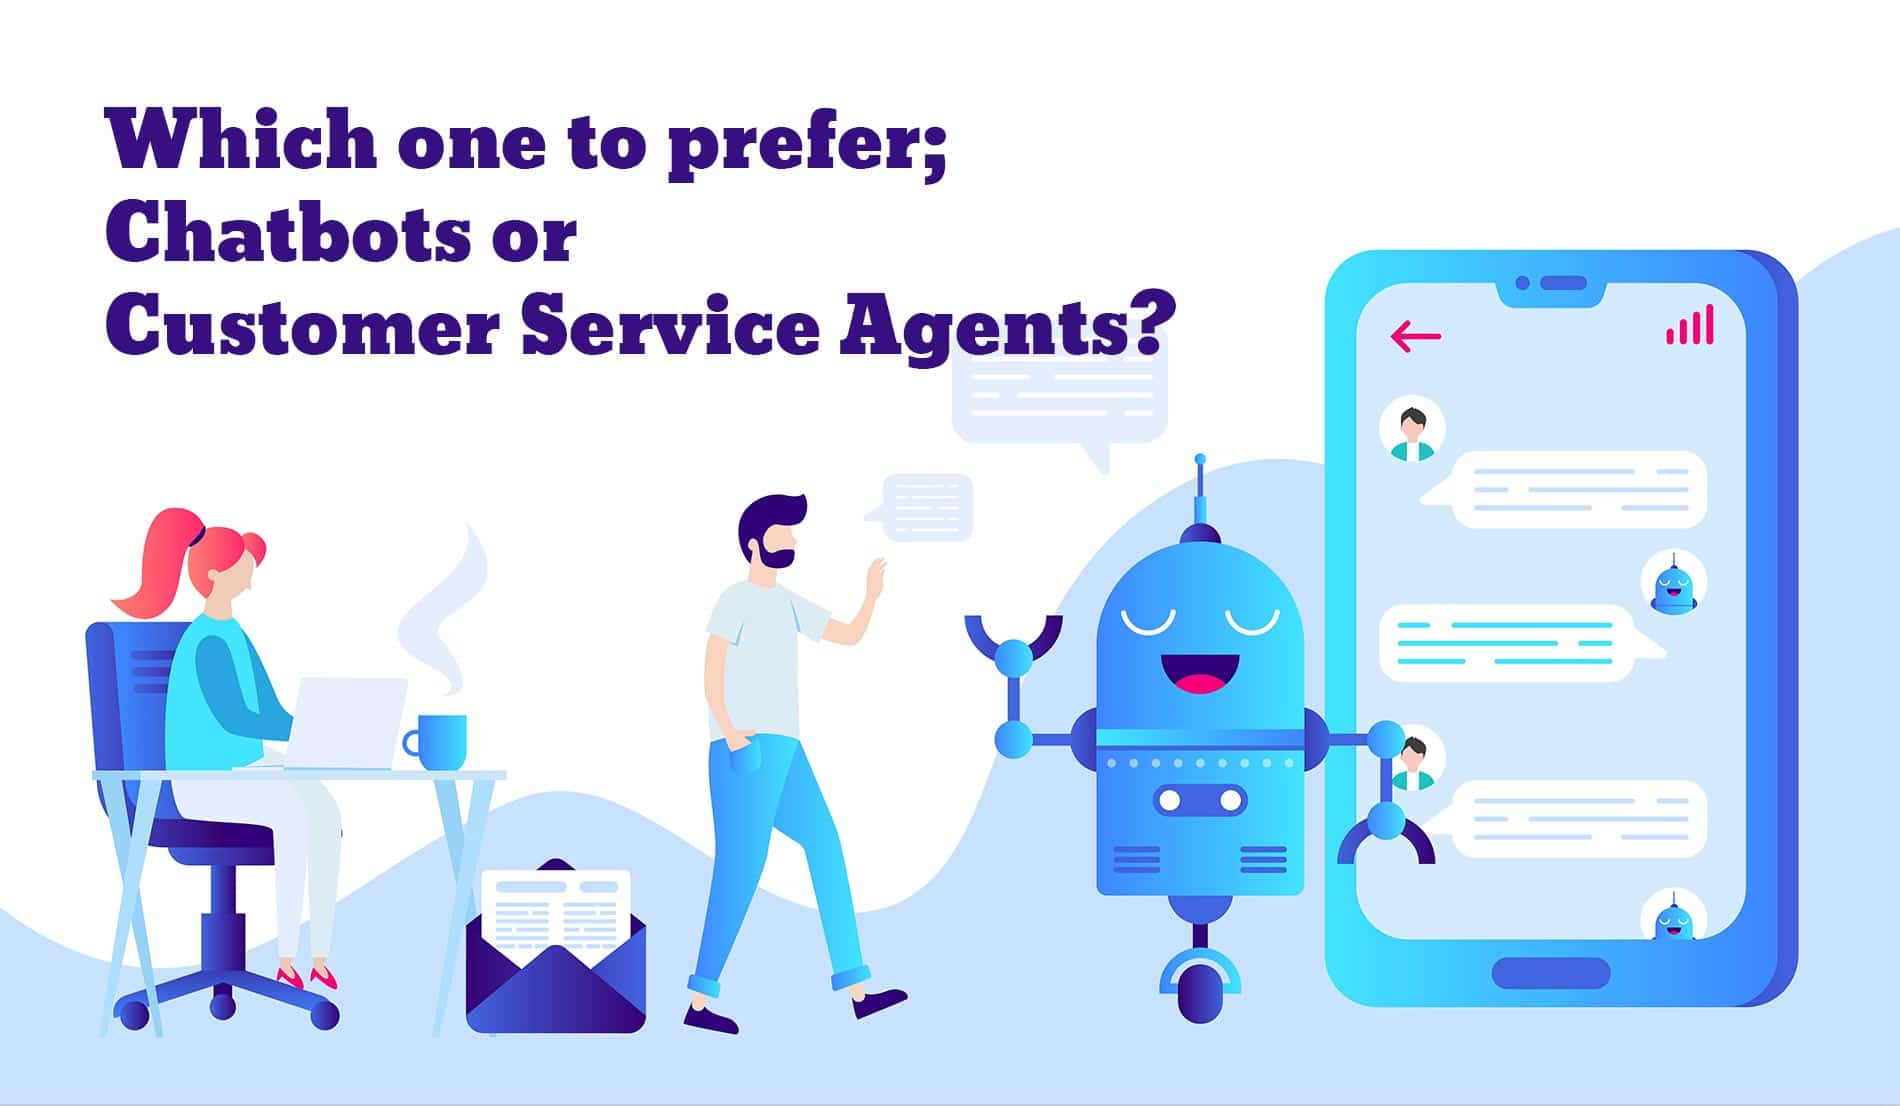 Chatbots vs Customer Service Agents